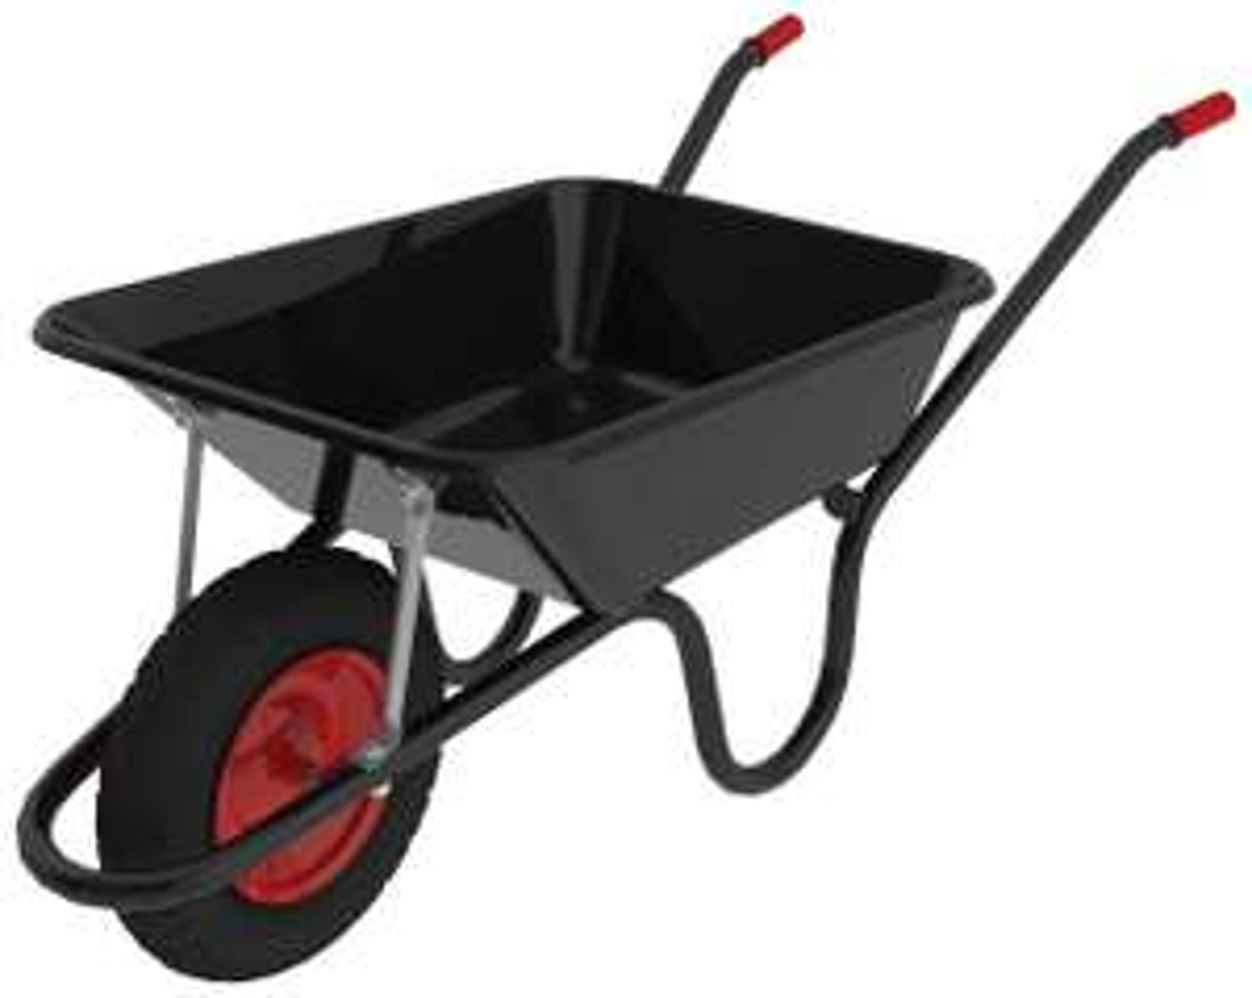 Chillington Camden Classic Black Wheelbarrow - 85L £27 @ Wickes